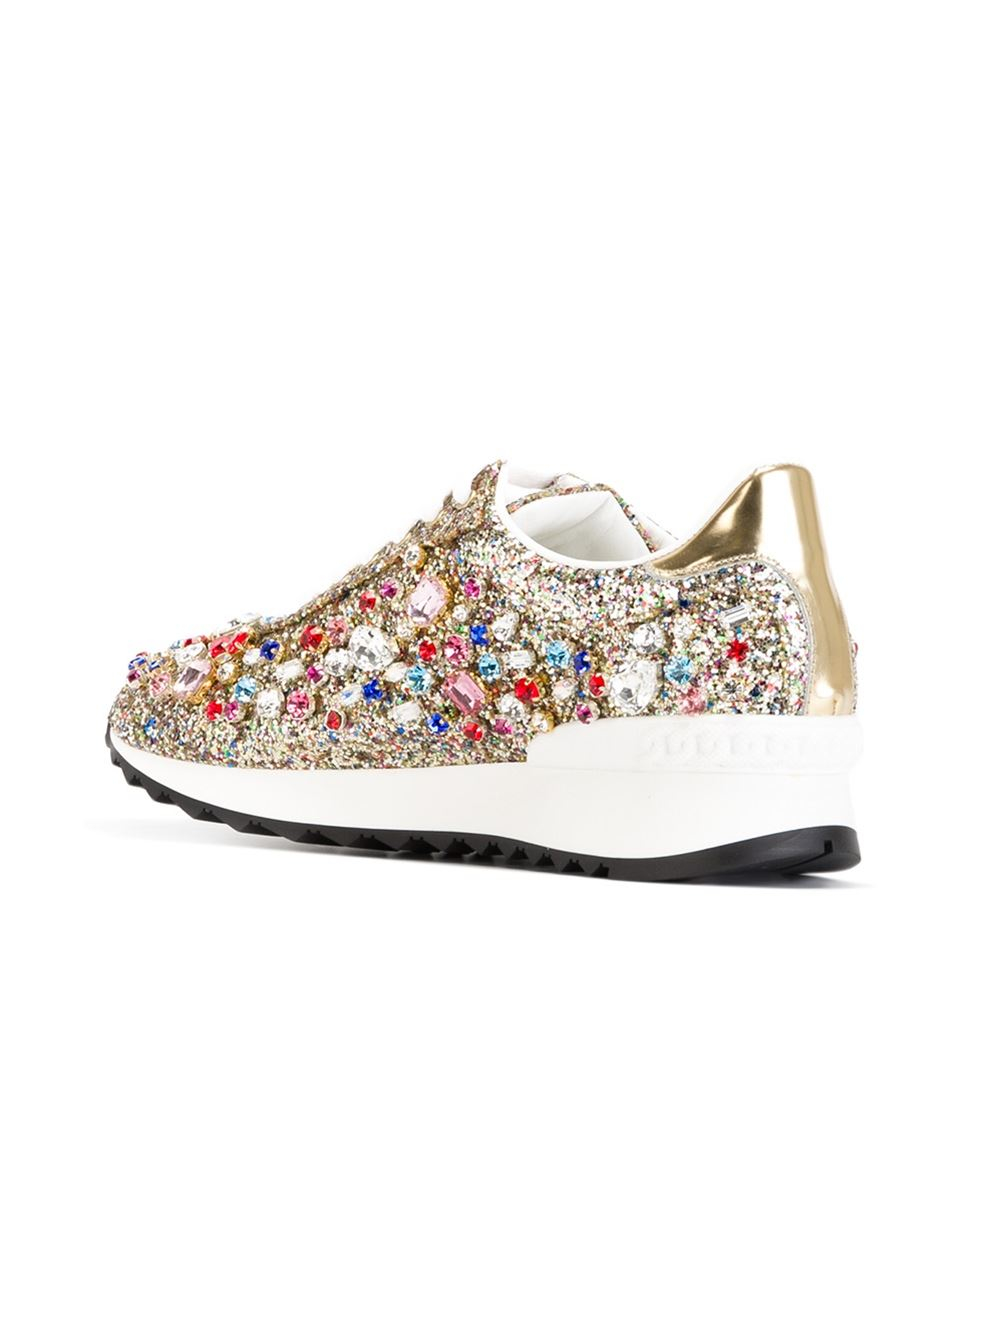 Ruban Casadei Chaussures Lacées - Métalliques htGUQZm